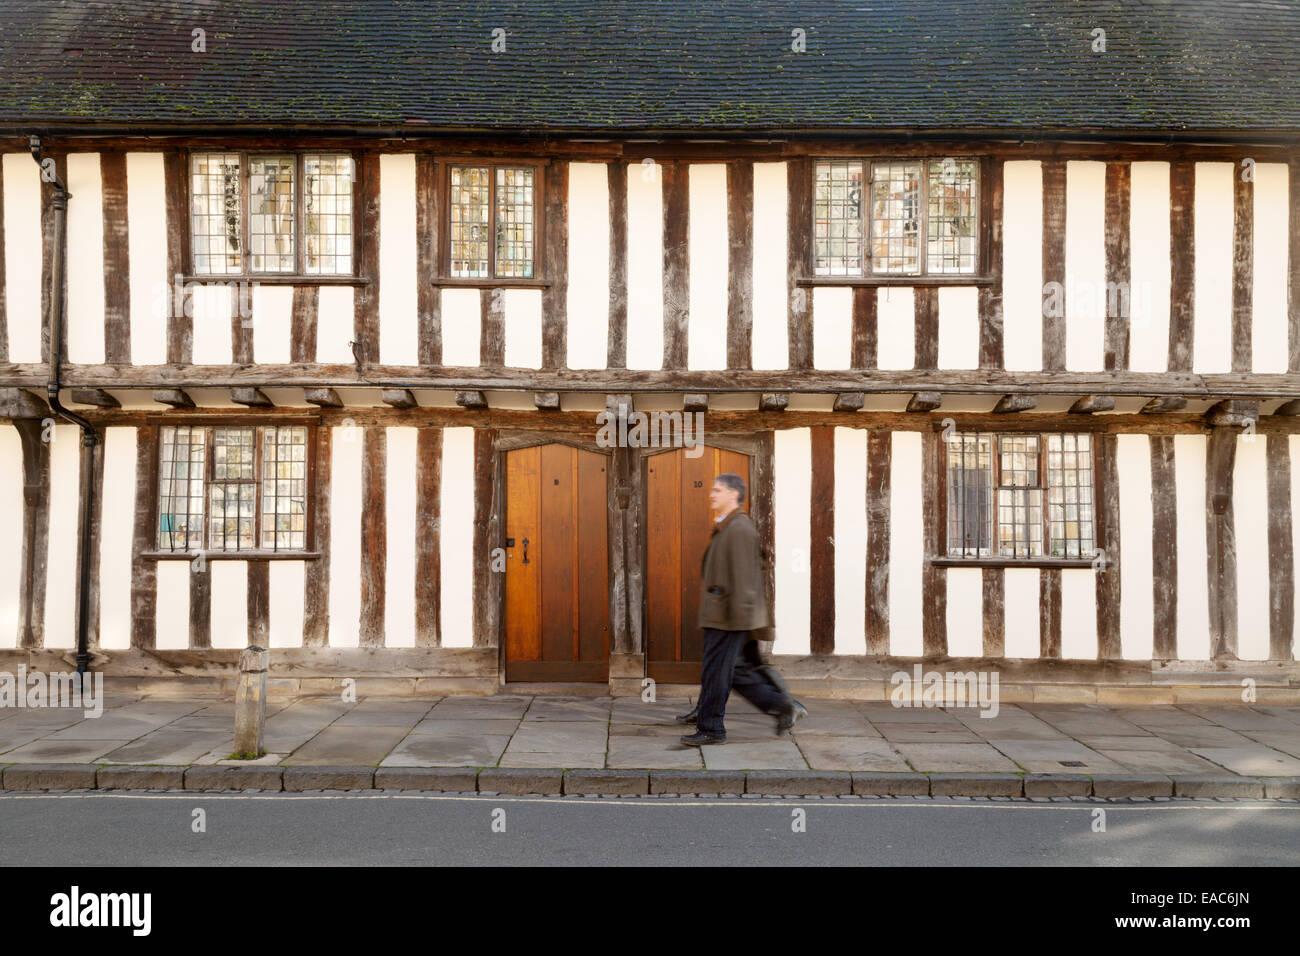 Medieval old tudor buildings - Alms houses, Stratford Upon Avon, Warwickshire, UK - Stock Image